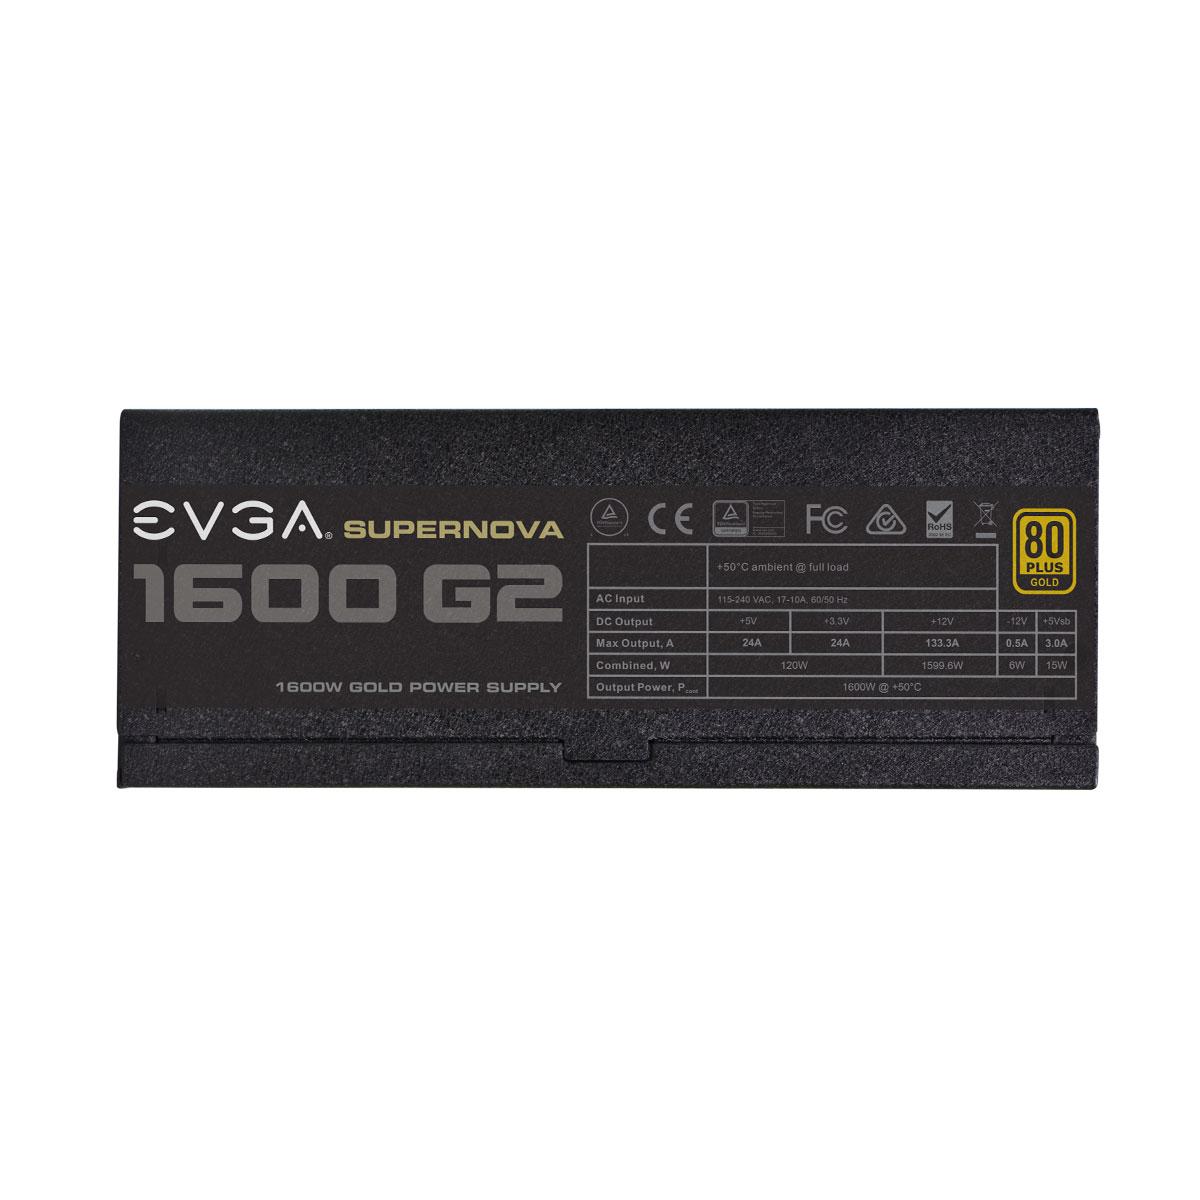 FUENTE REAL 1600W SUPER NOVA GOLD - EVGA